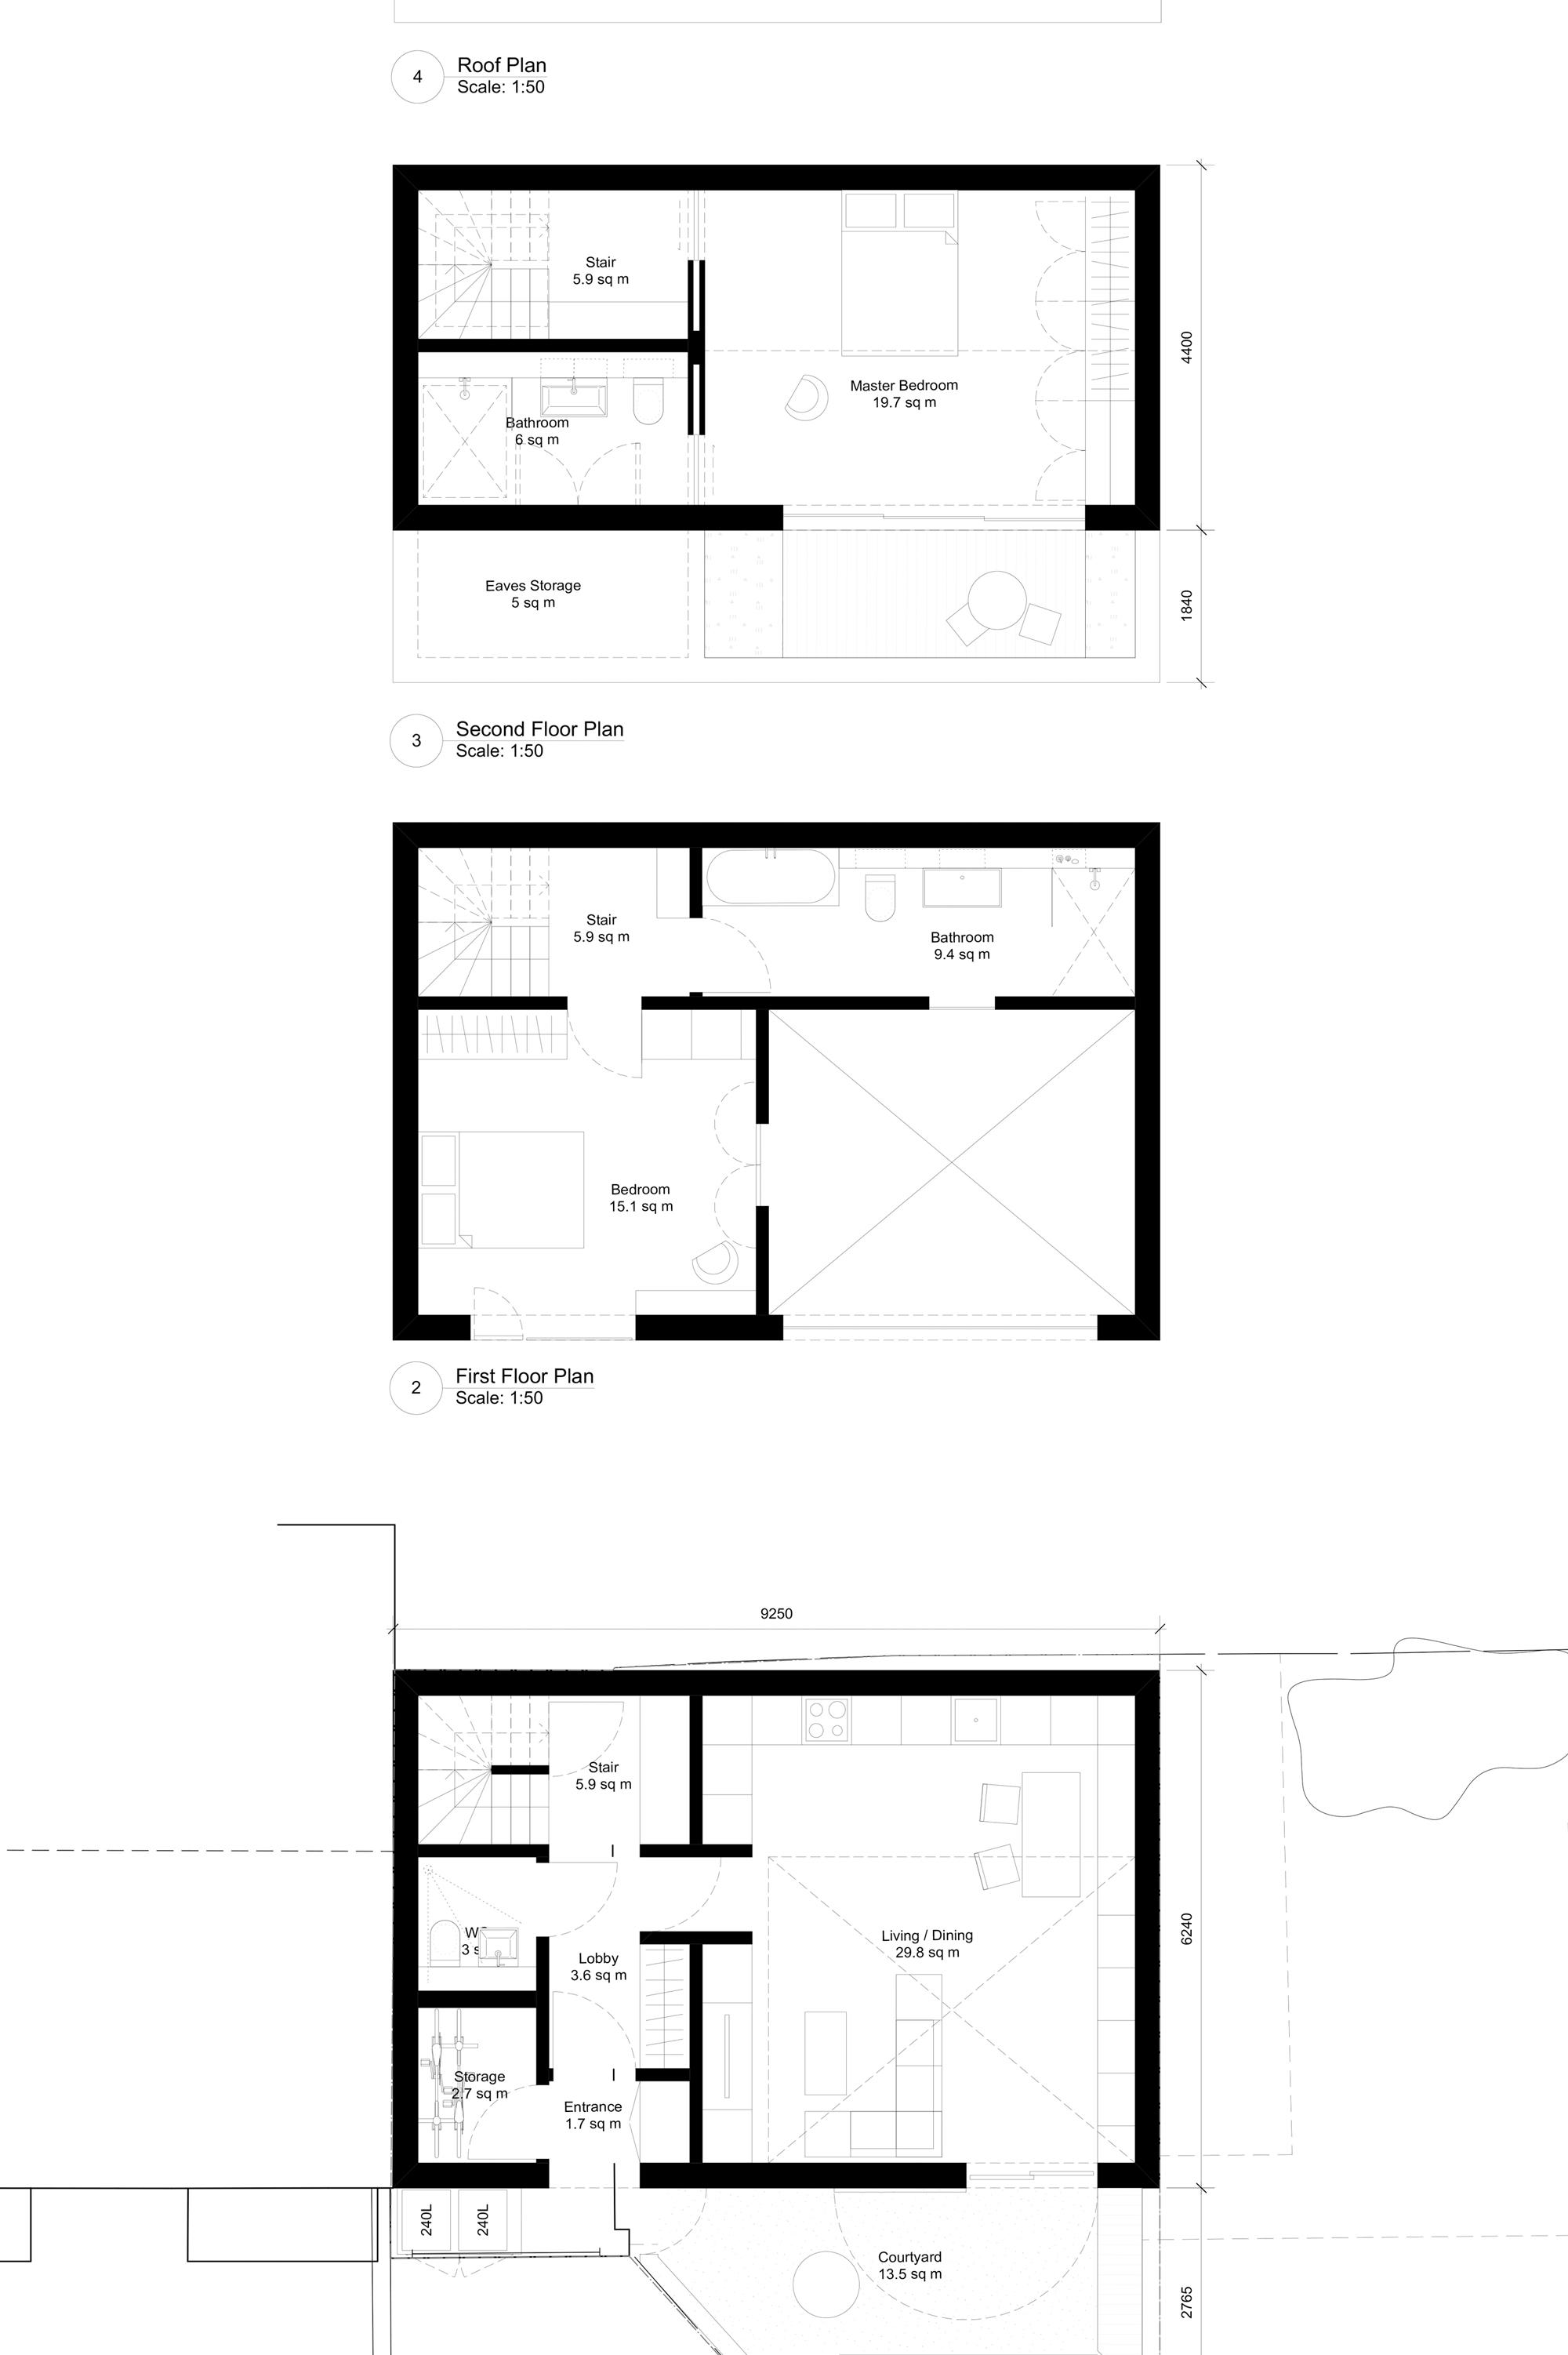 cube-haus-carl-turner-peckham-se15-cs-2000×1332-05-Floorplan